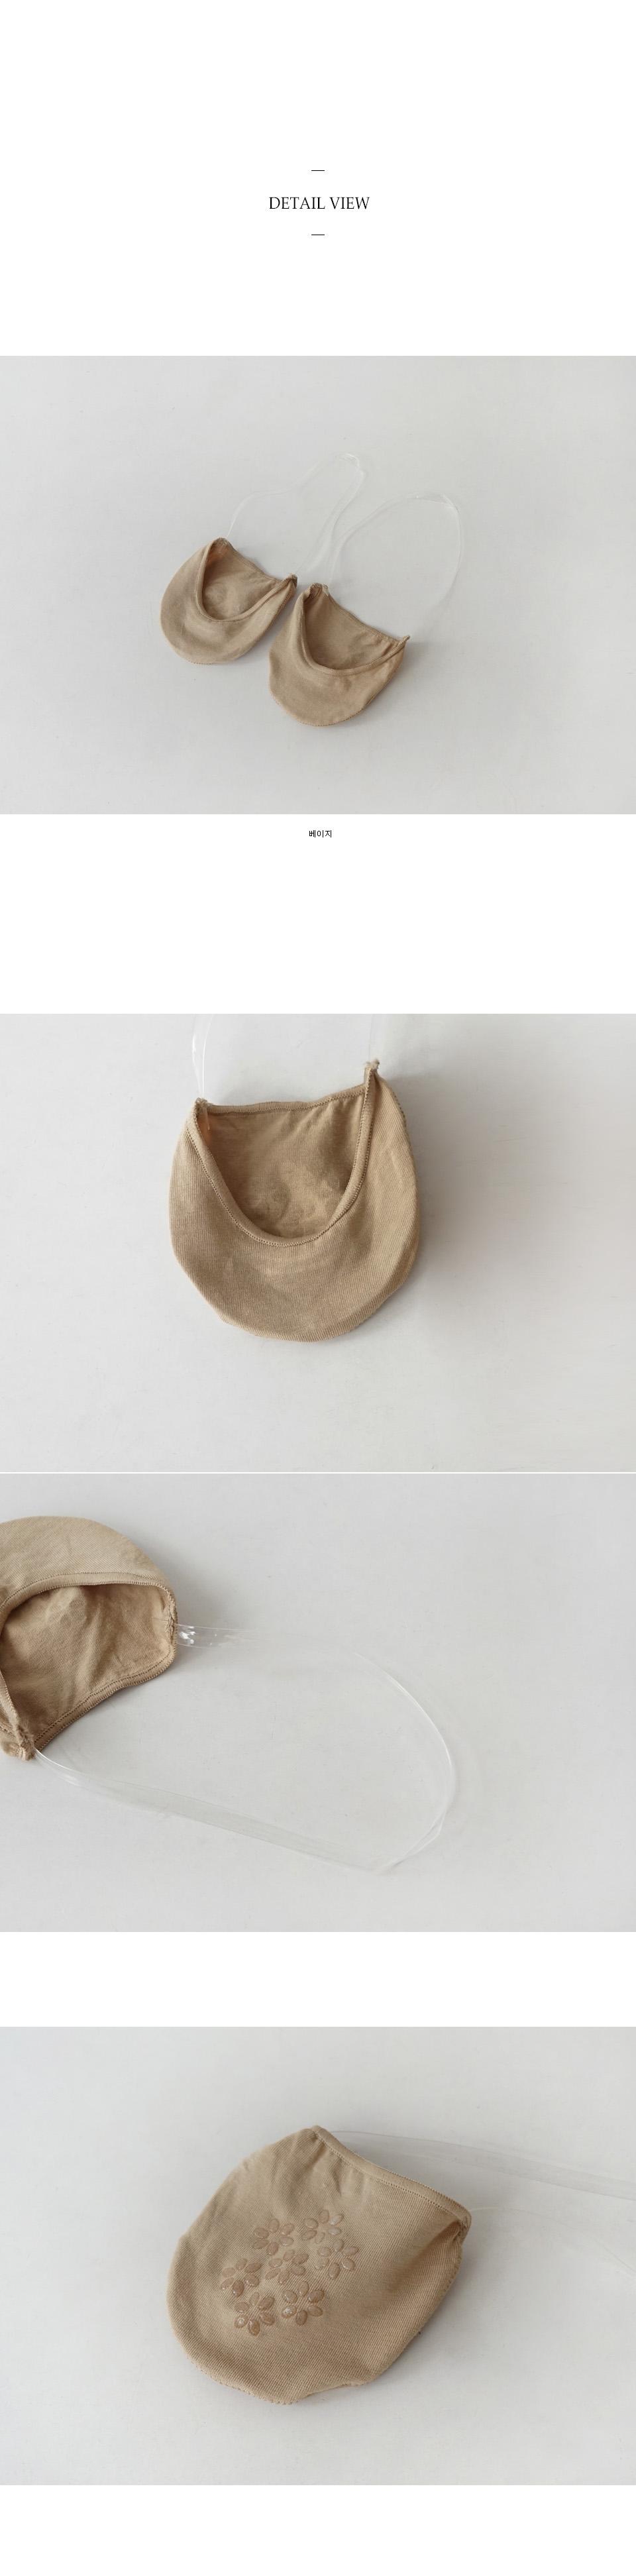 nude string fake socks